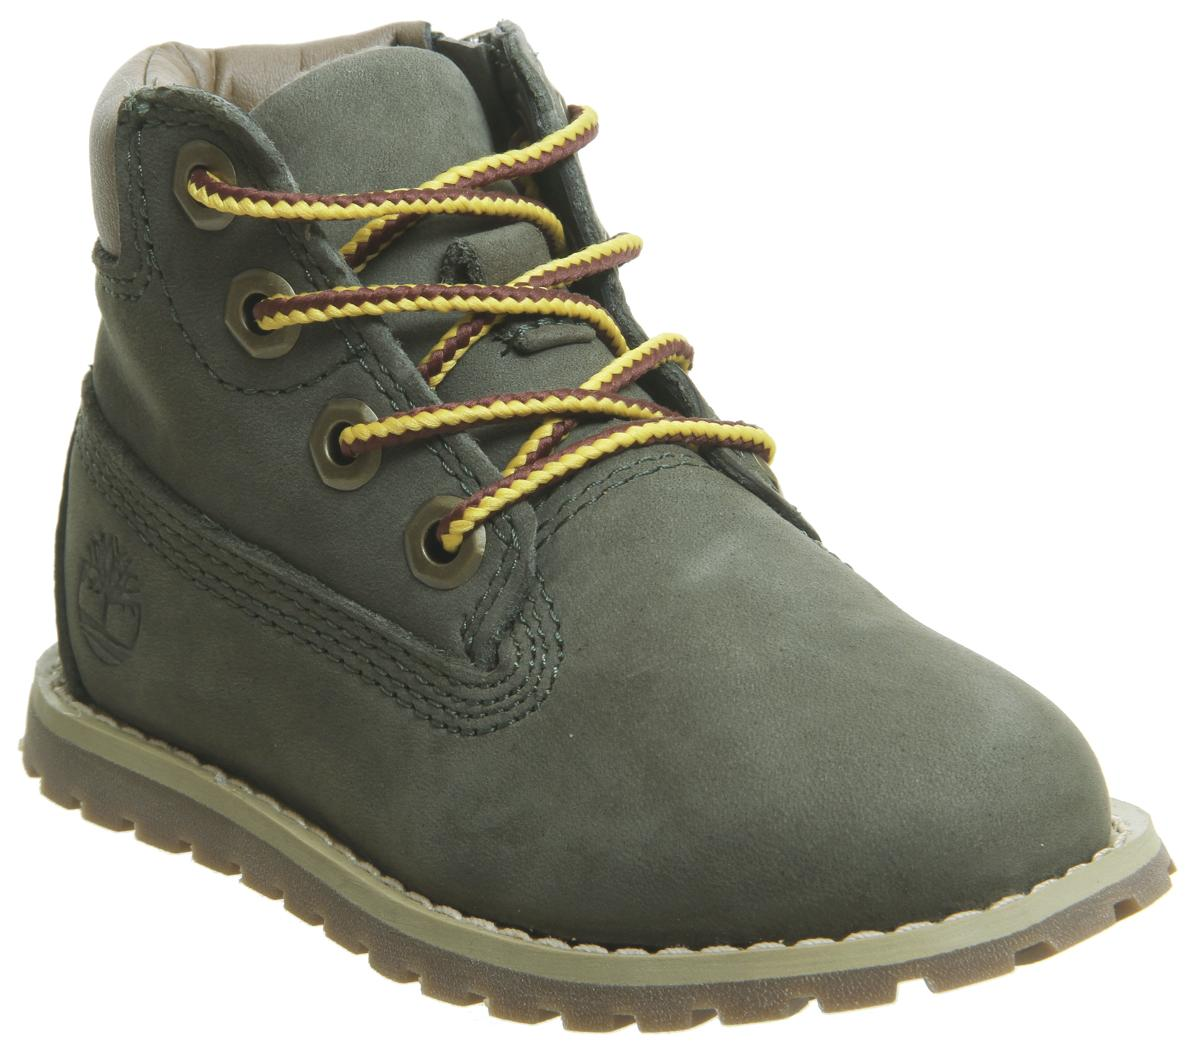 Pokey Pine 6 Inch Boots